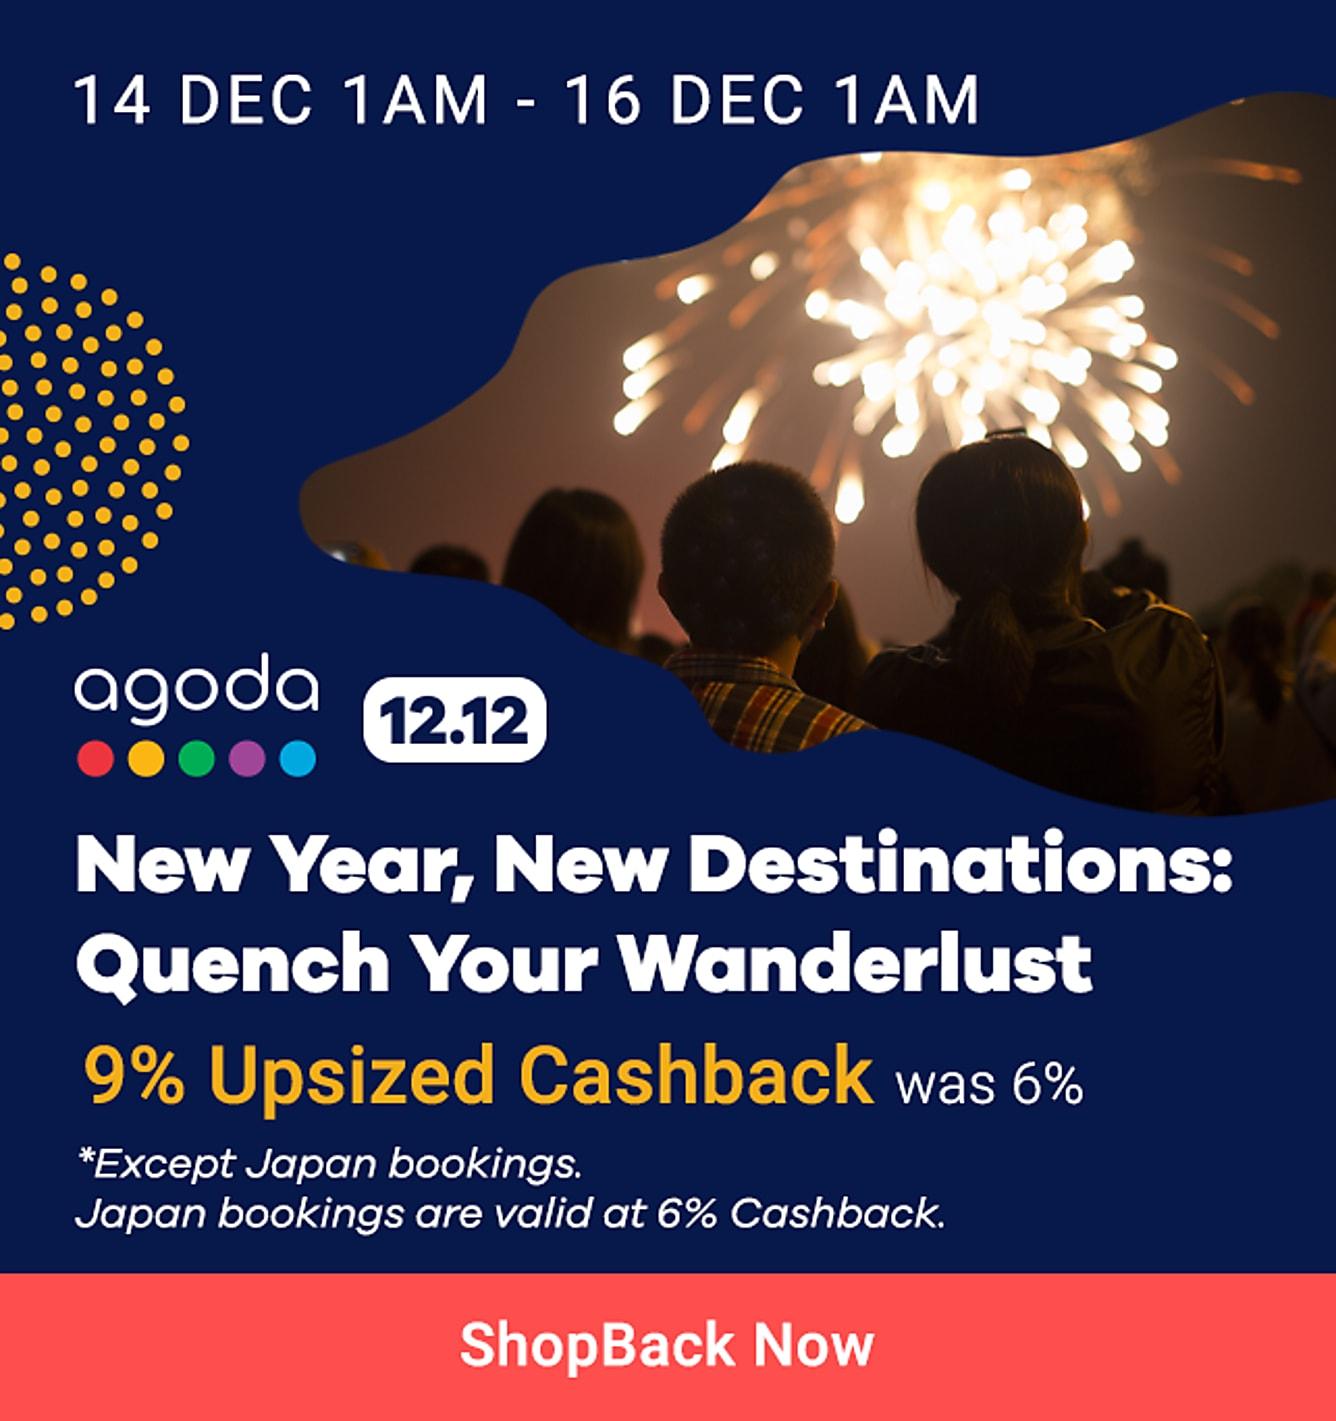 Agoda_12.12.2019_12 Dec 1am - 14 Dec 1am | Agoda_12.12.2019_14 Dec 1am - 16 Dec 1am